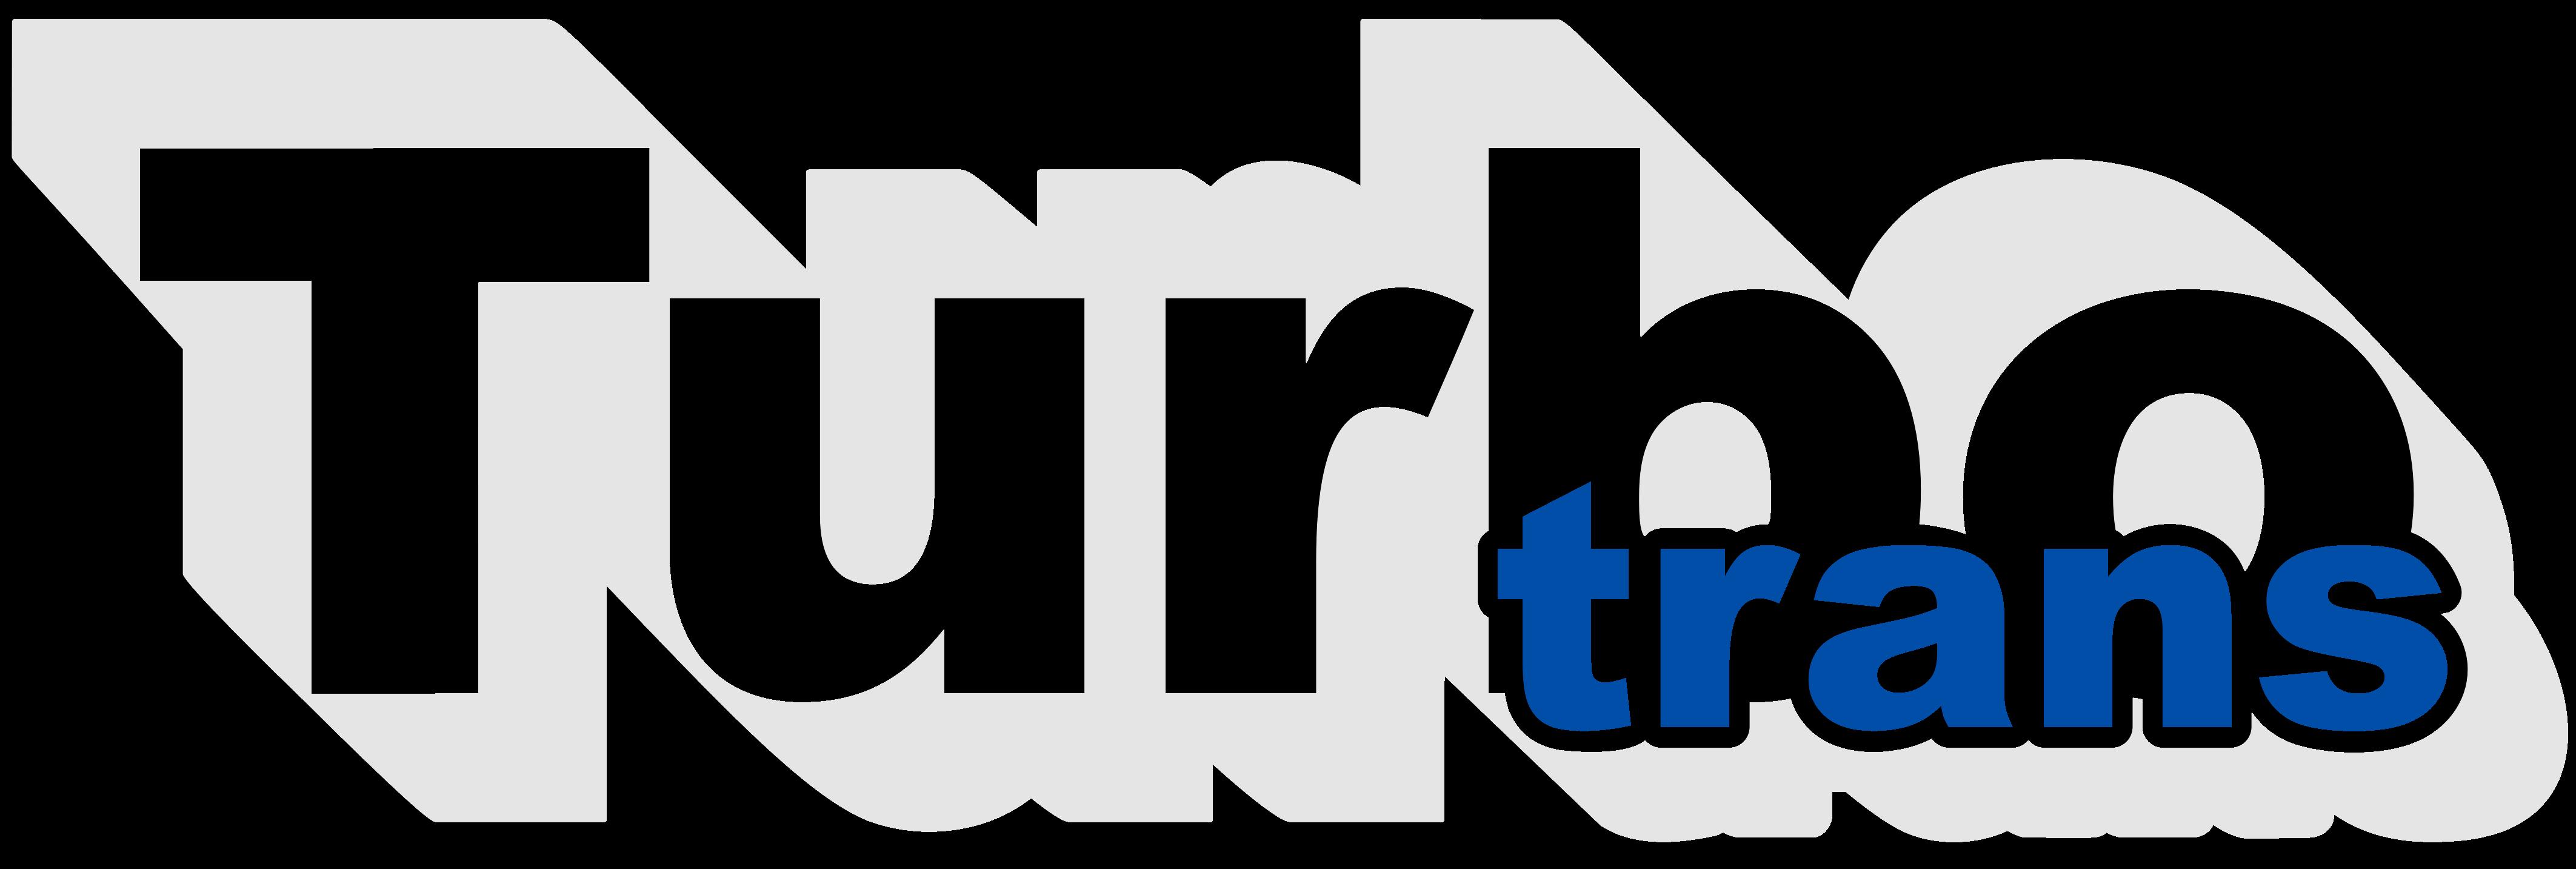 Turbo-Trans